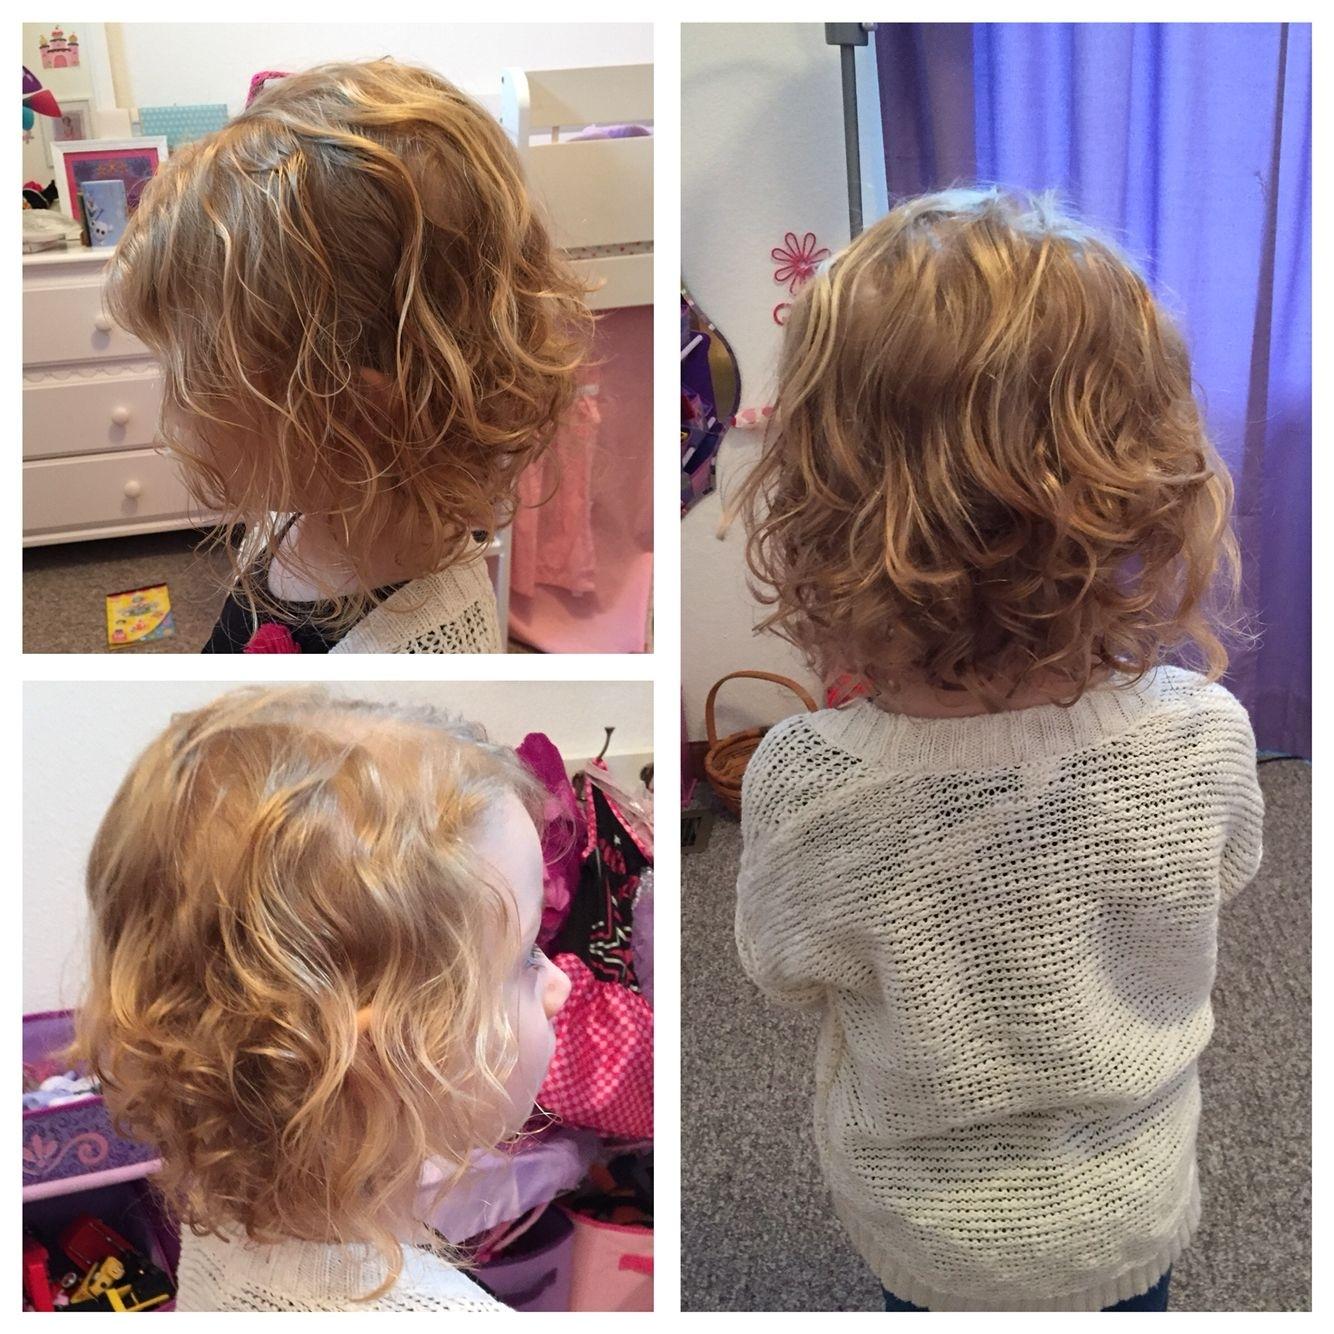 Toddler Girl Curly Hair Bob Short Haircut | Clothing Ideas pertaining to Haircut For Curly Hair Toddler Girl